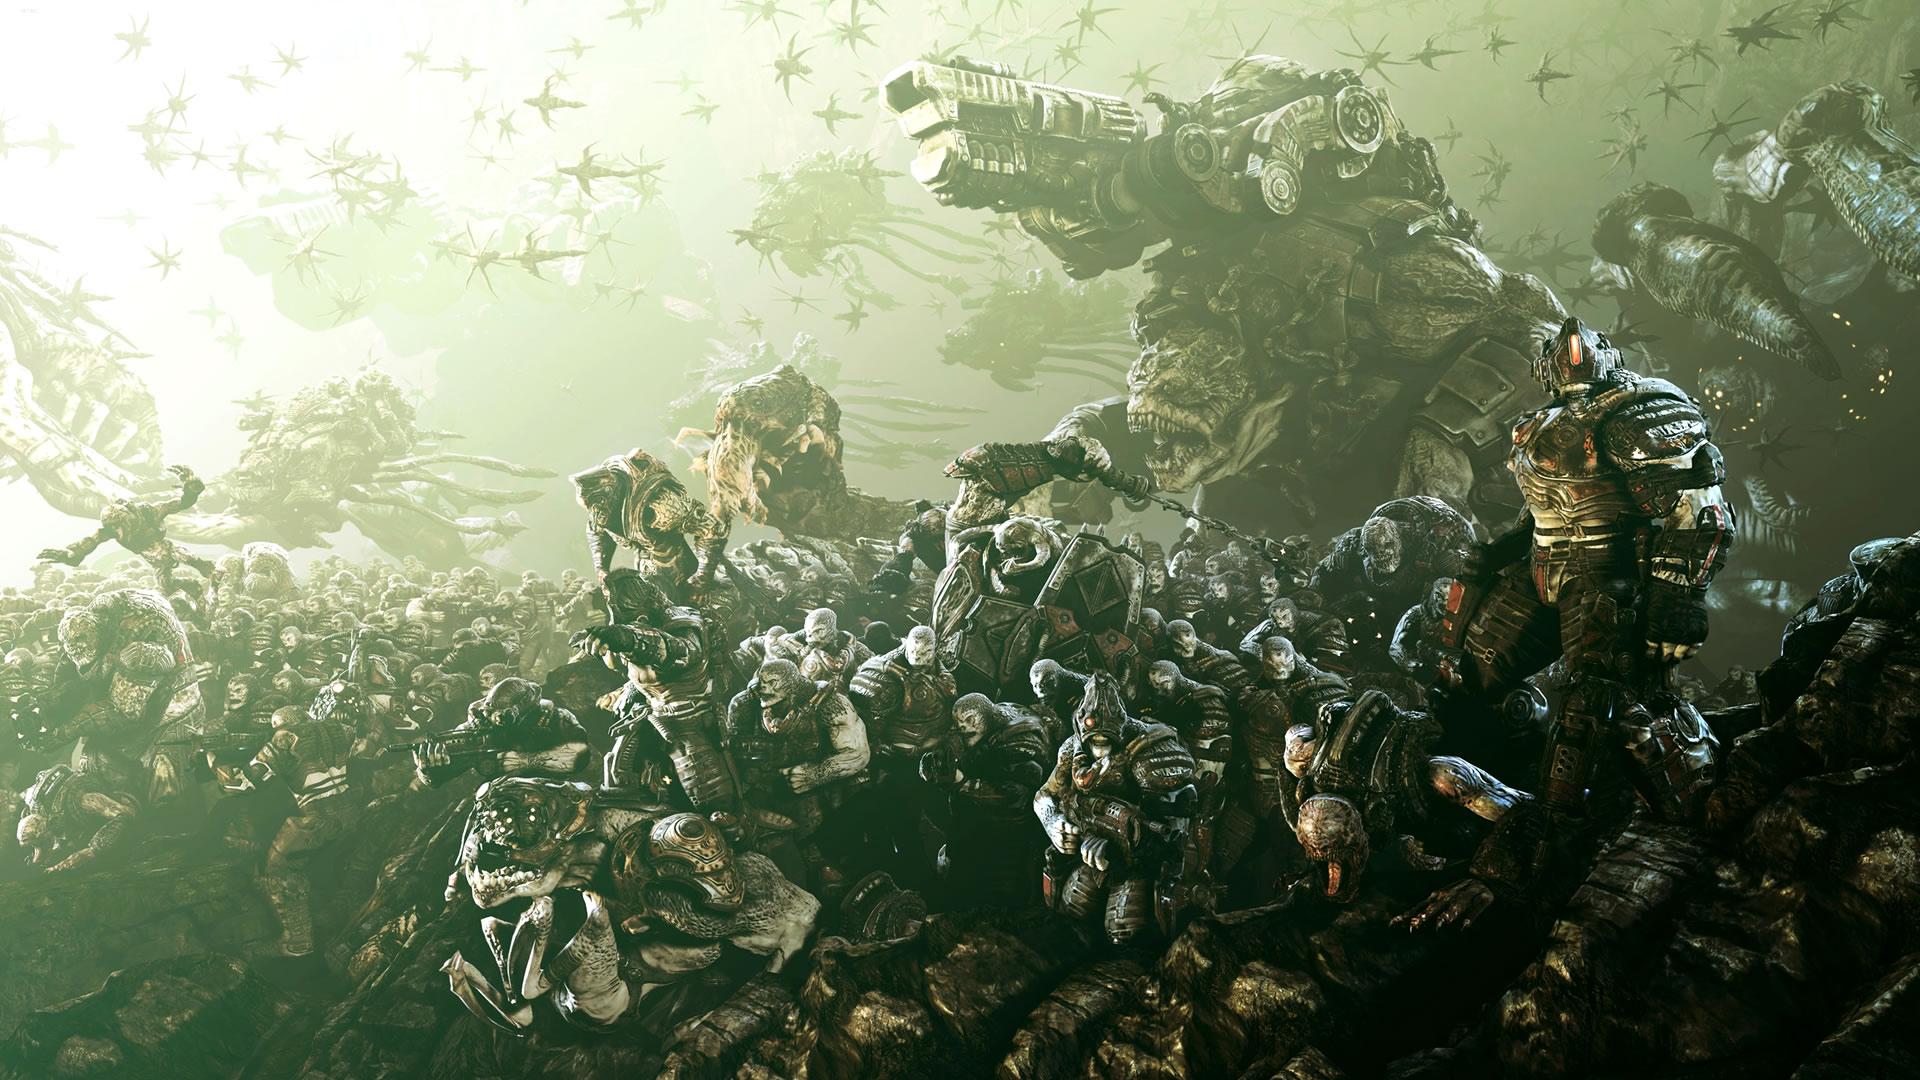 Wallpapers Gears of War 3 HD - Taringa!